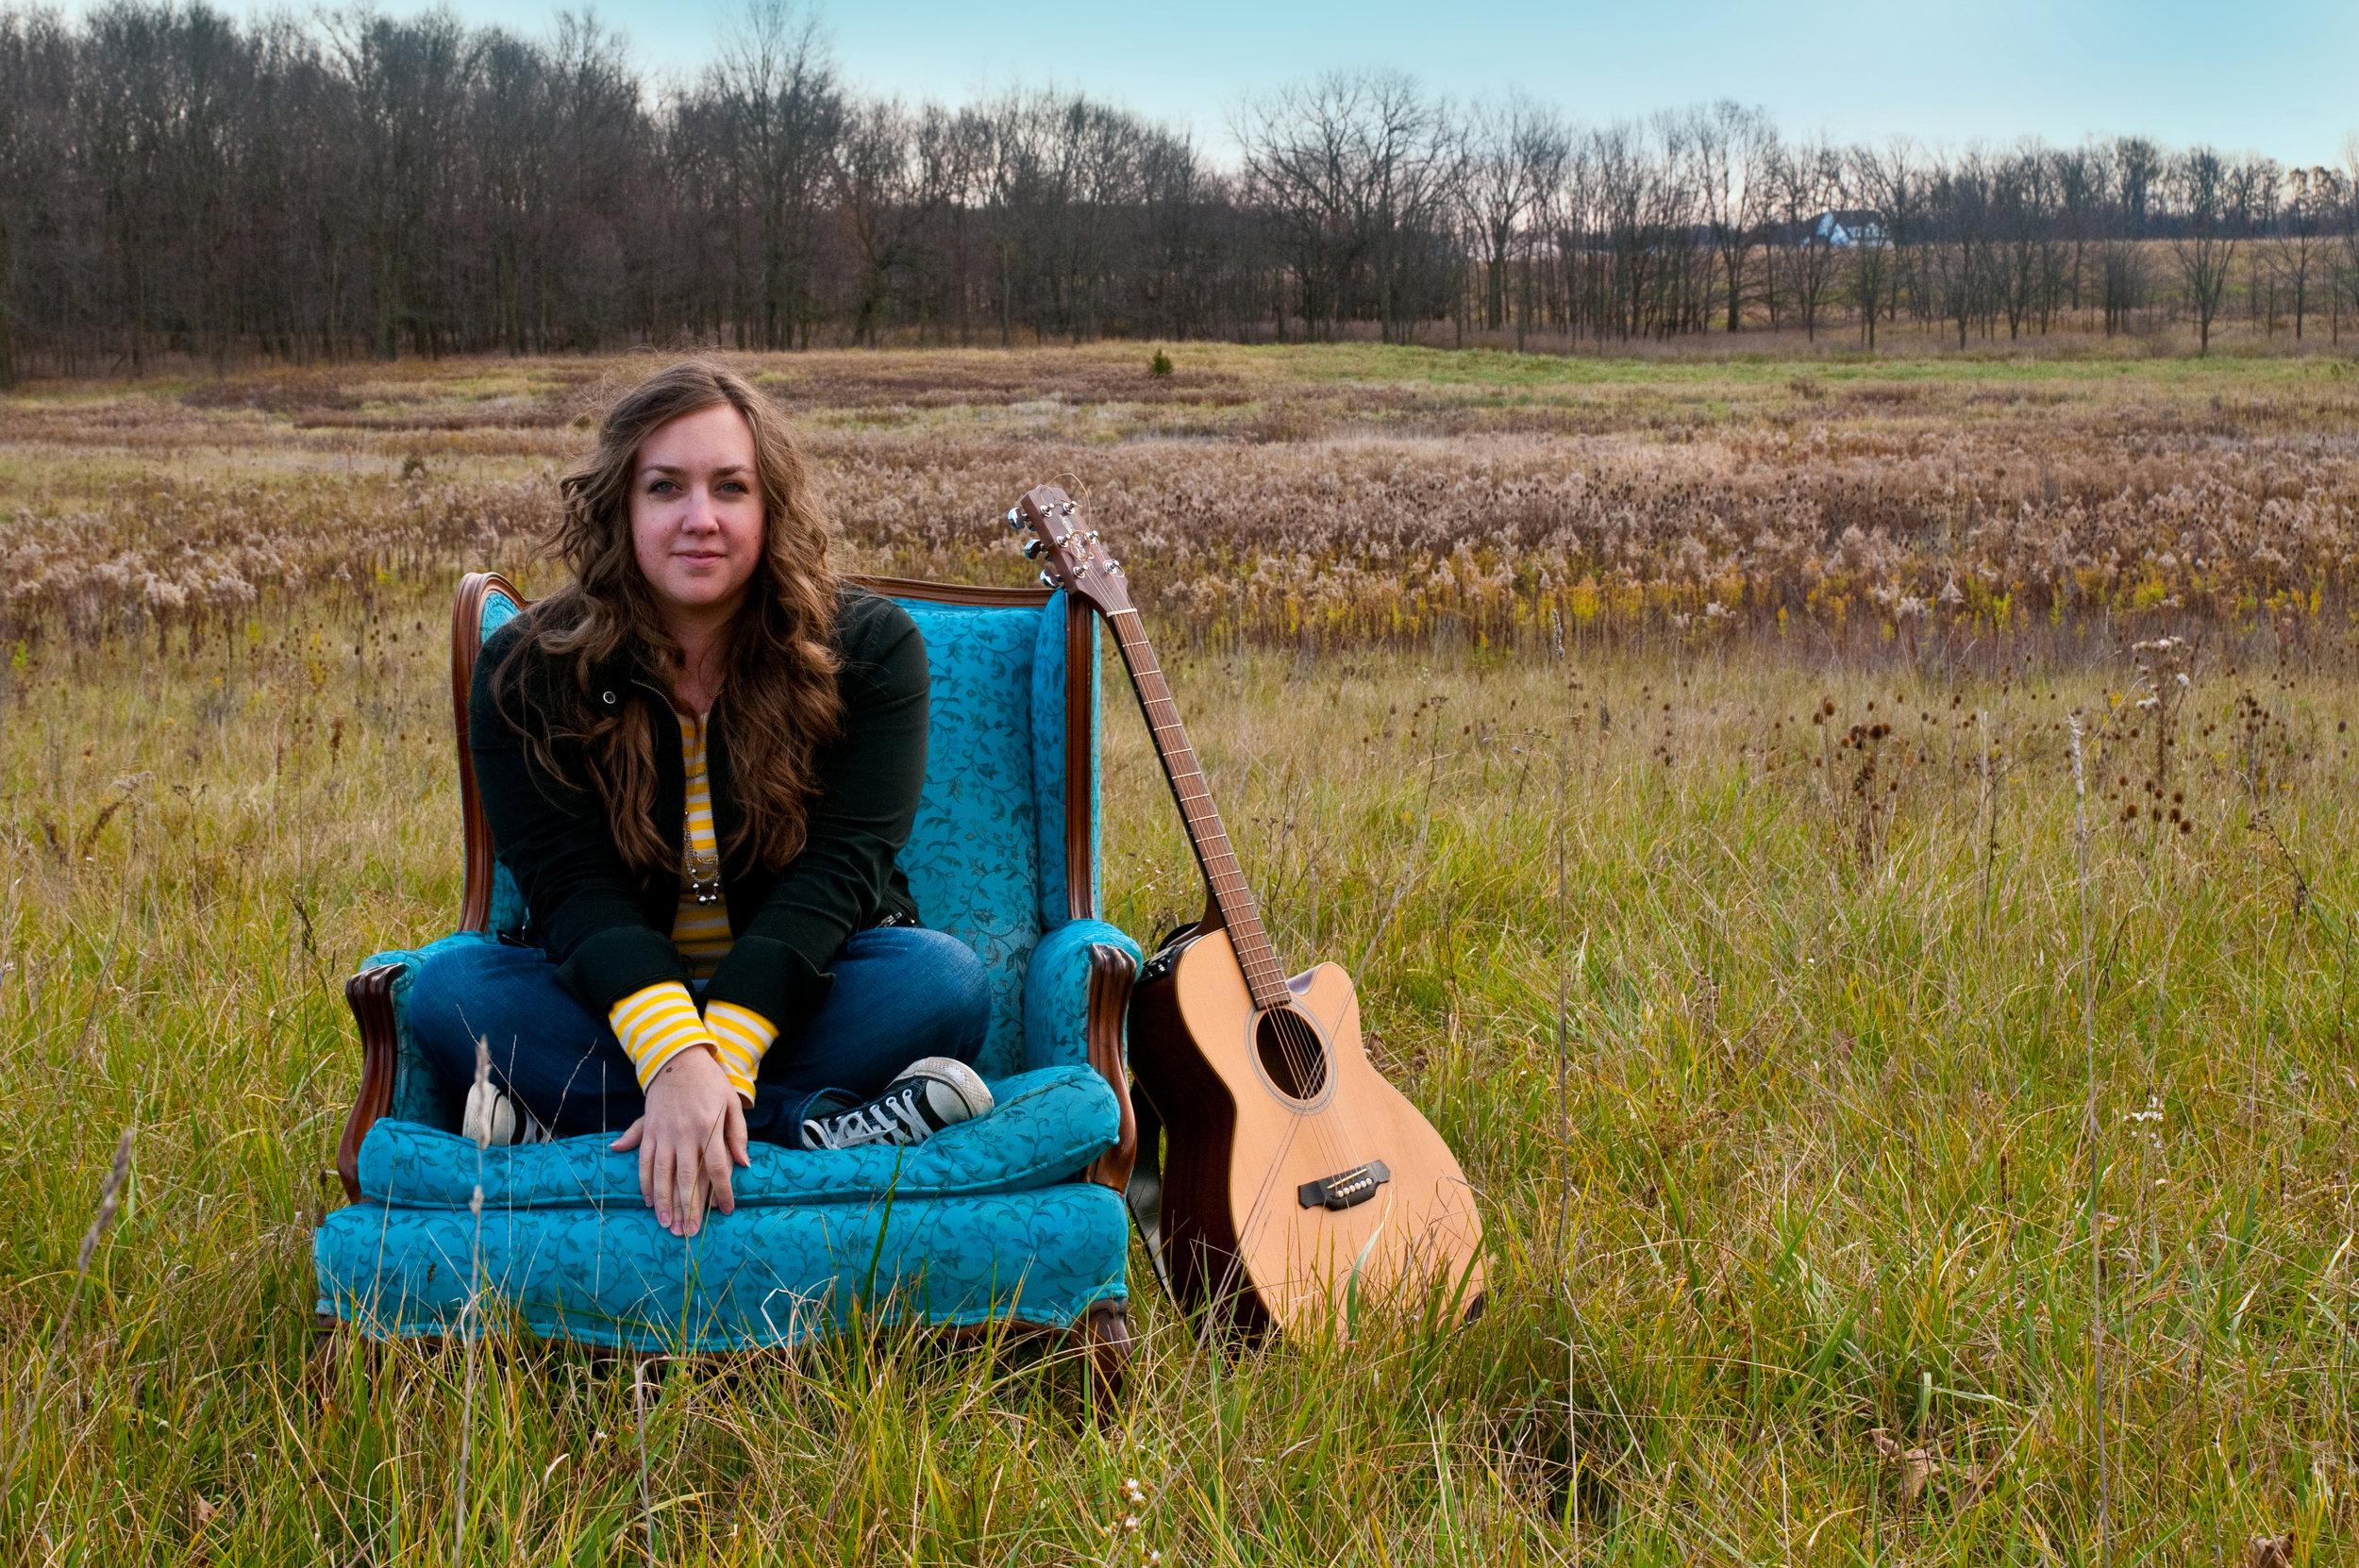 Amy Cox-blue chair-field-guitar.jpg